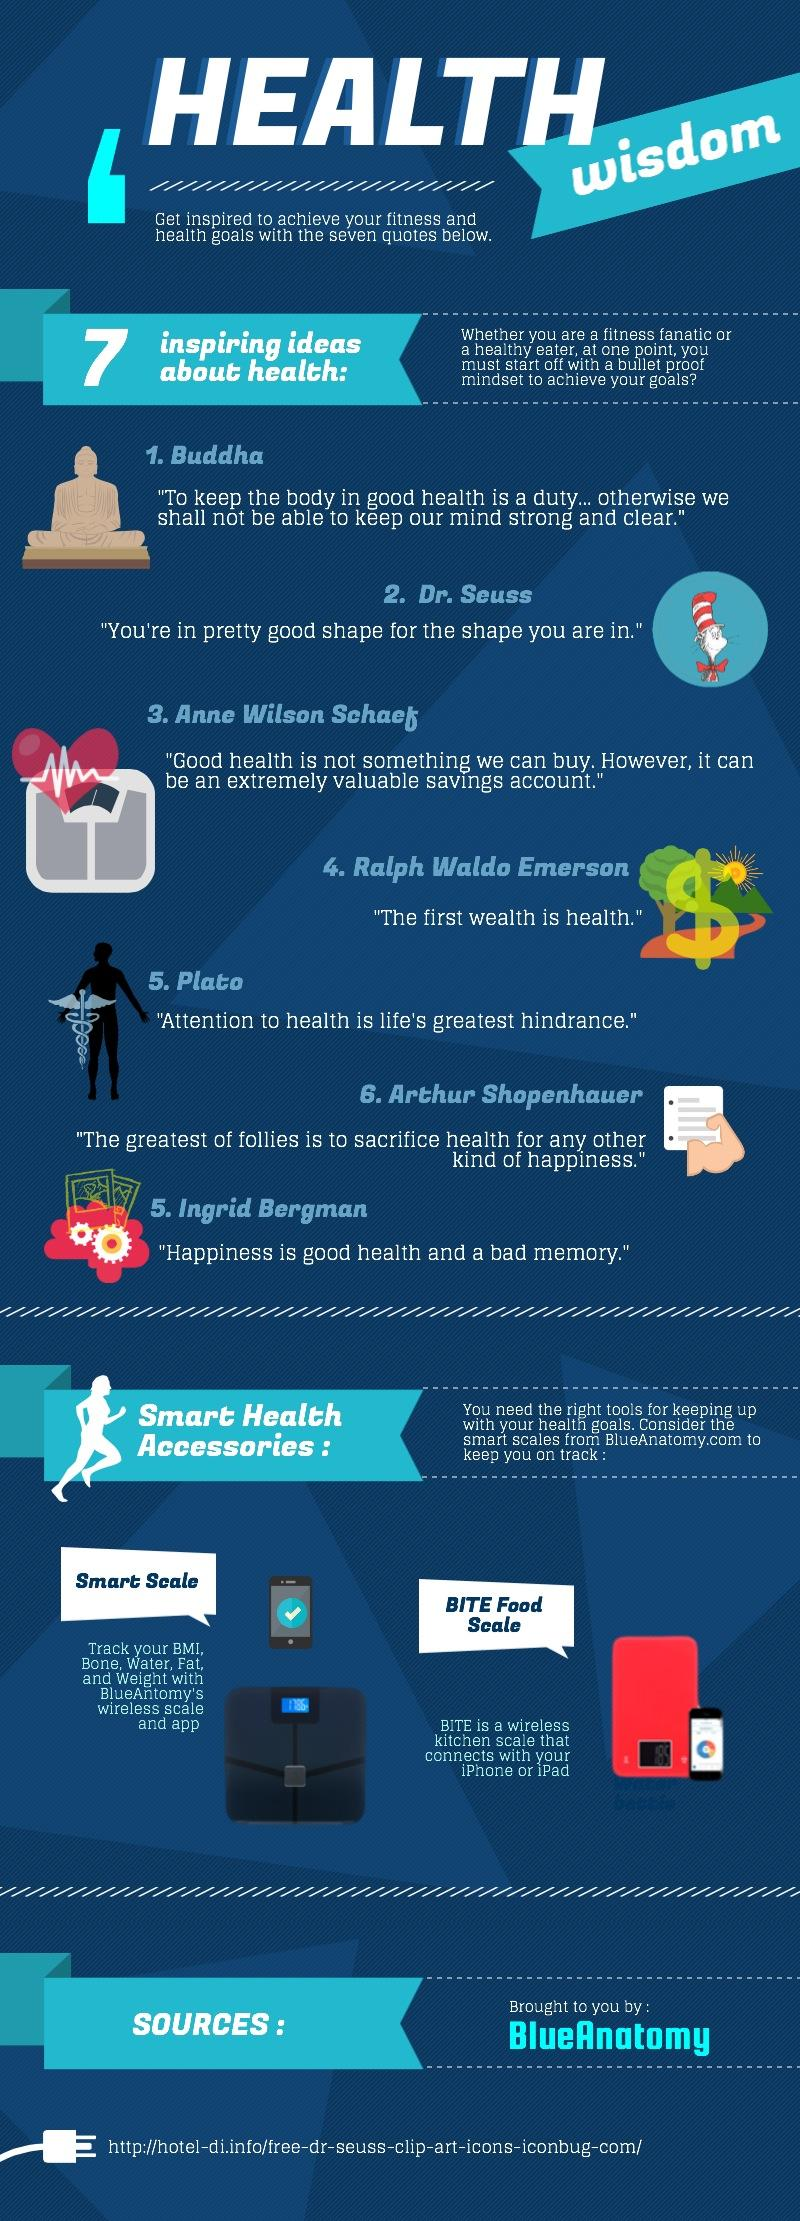 Health Wisdom: Plato, Dr. Seuss, Ingrid Bergman... - image 1 - student project